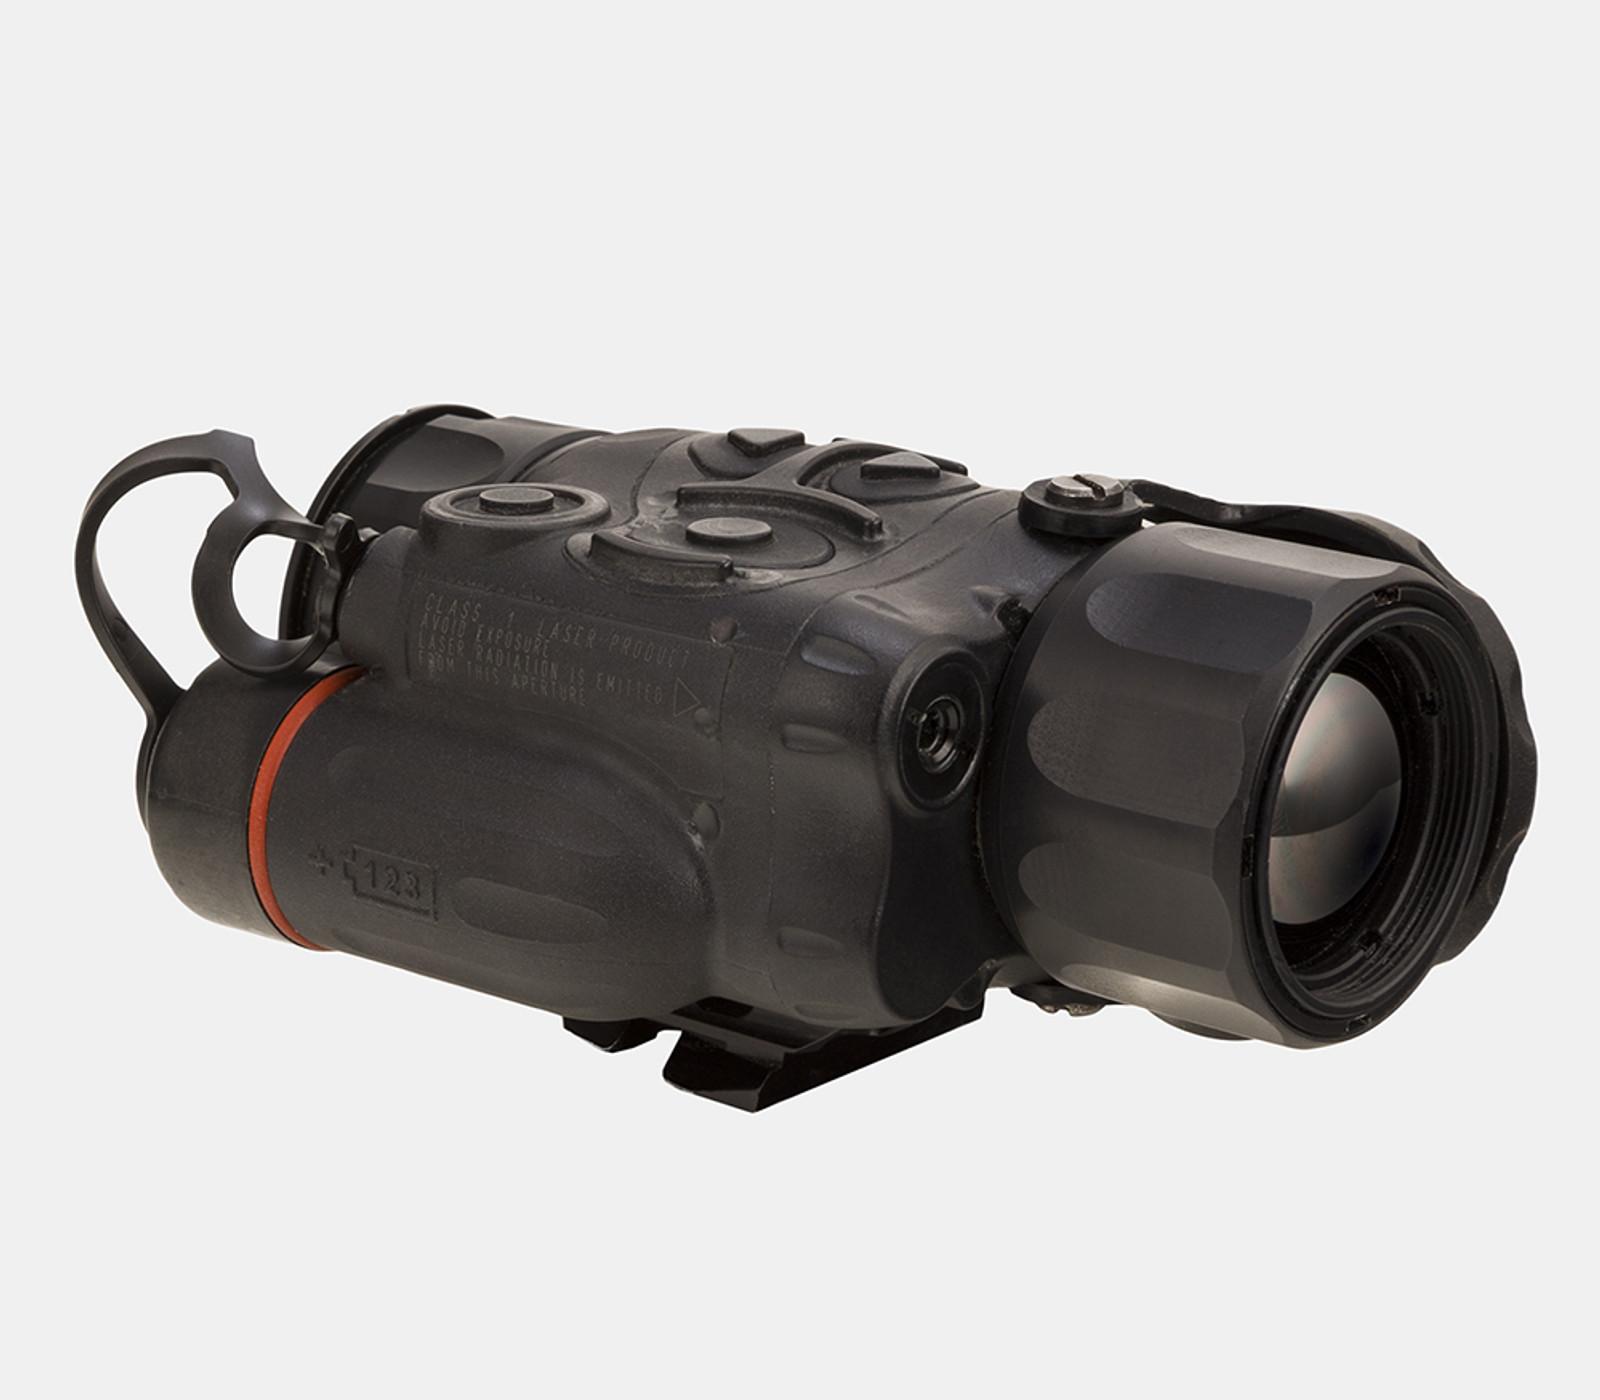 SkeetIRx Micro Thermal Monocular